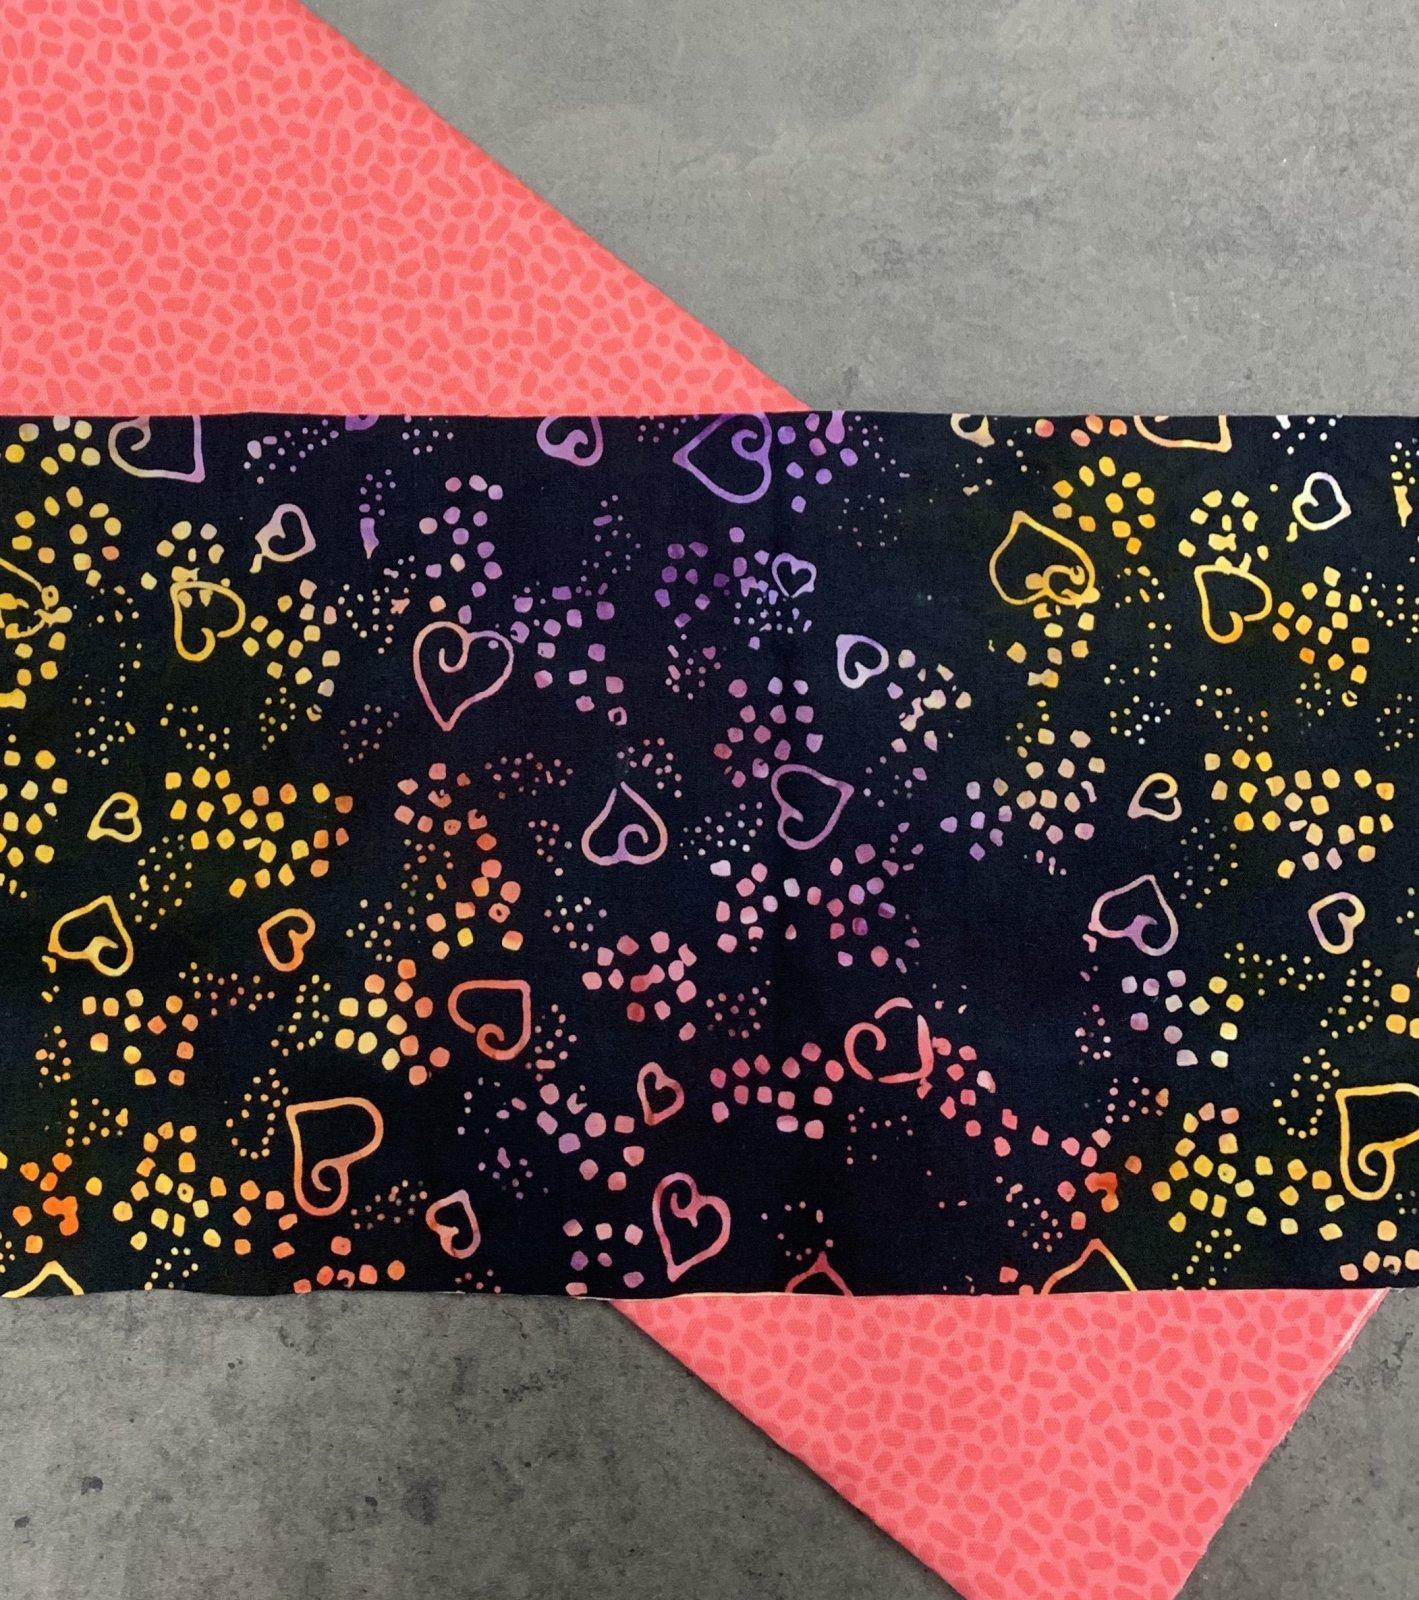 Batik Face Masks (makes 4-5) - Hearts